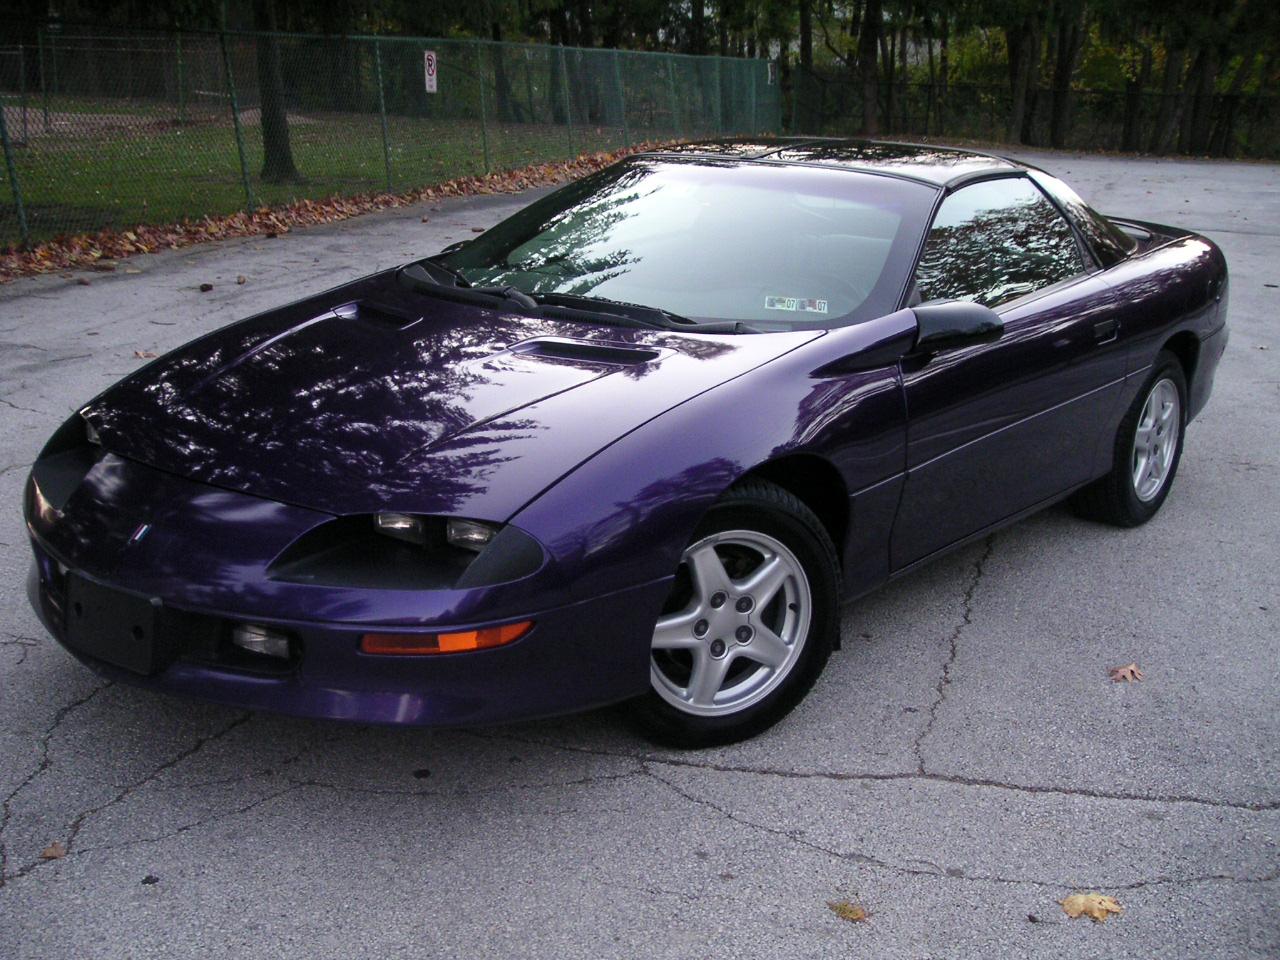 1997 to 1998 bright purple metallic camaro rs z28 don t quote pics ls1tech camaro and firebird forum discussion